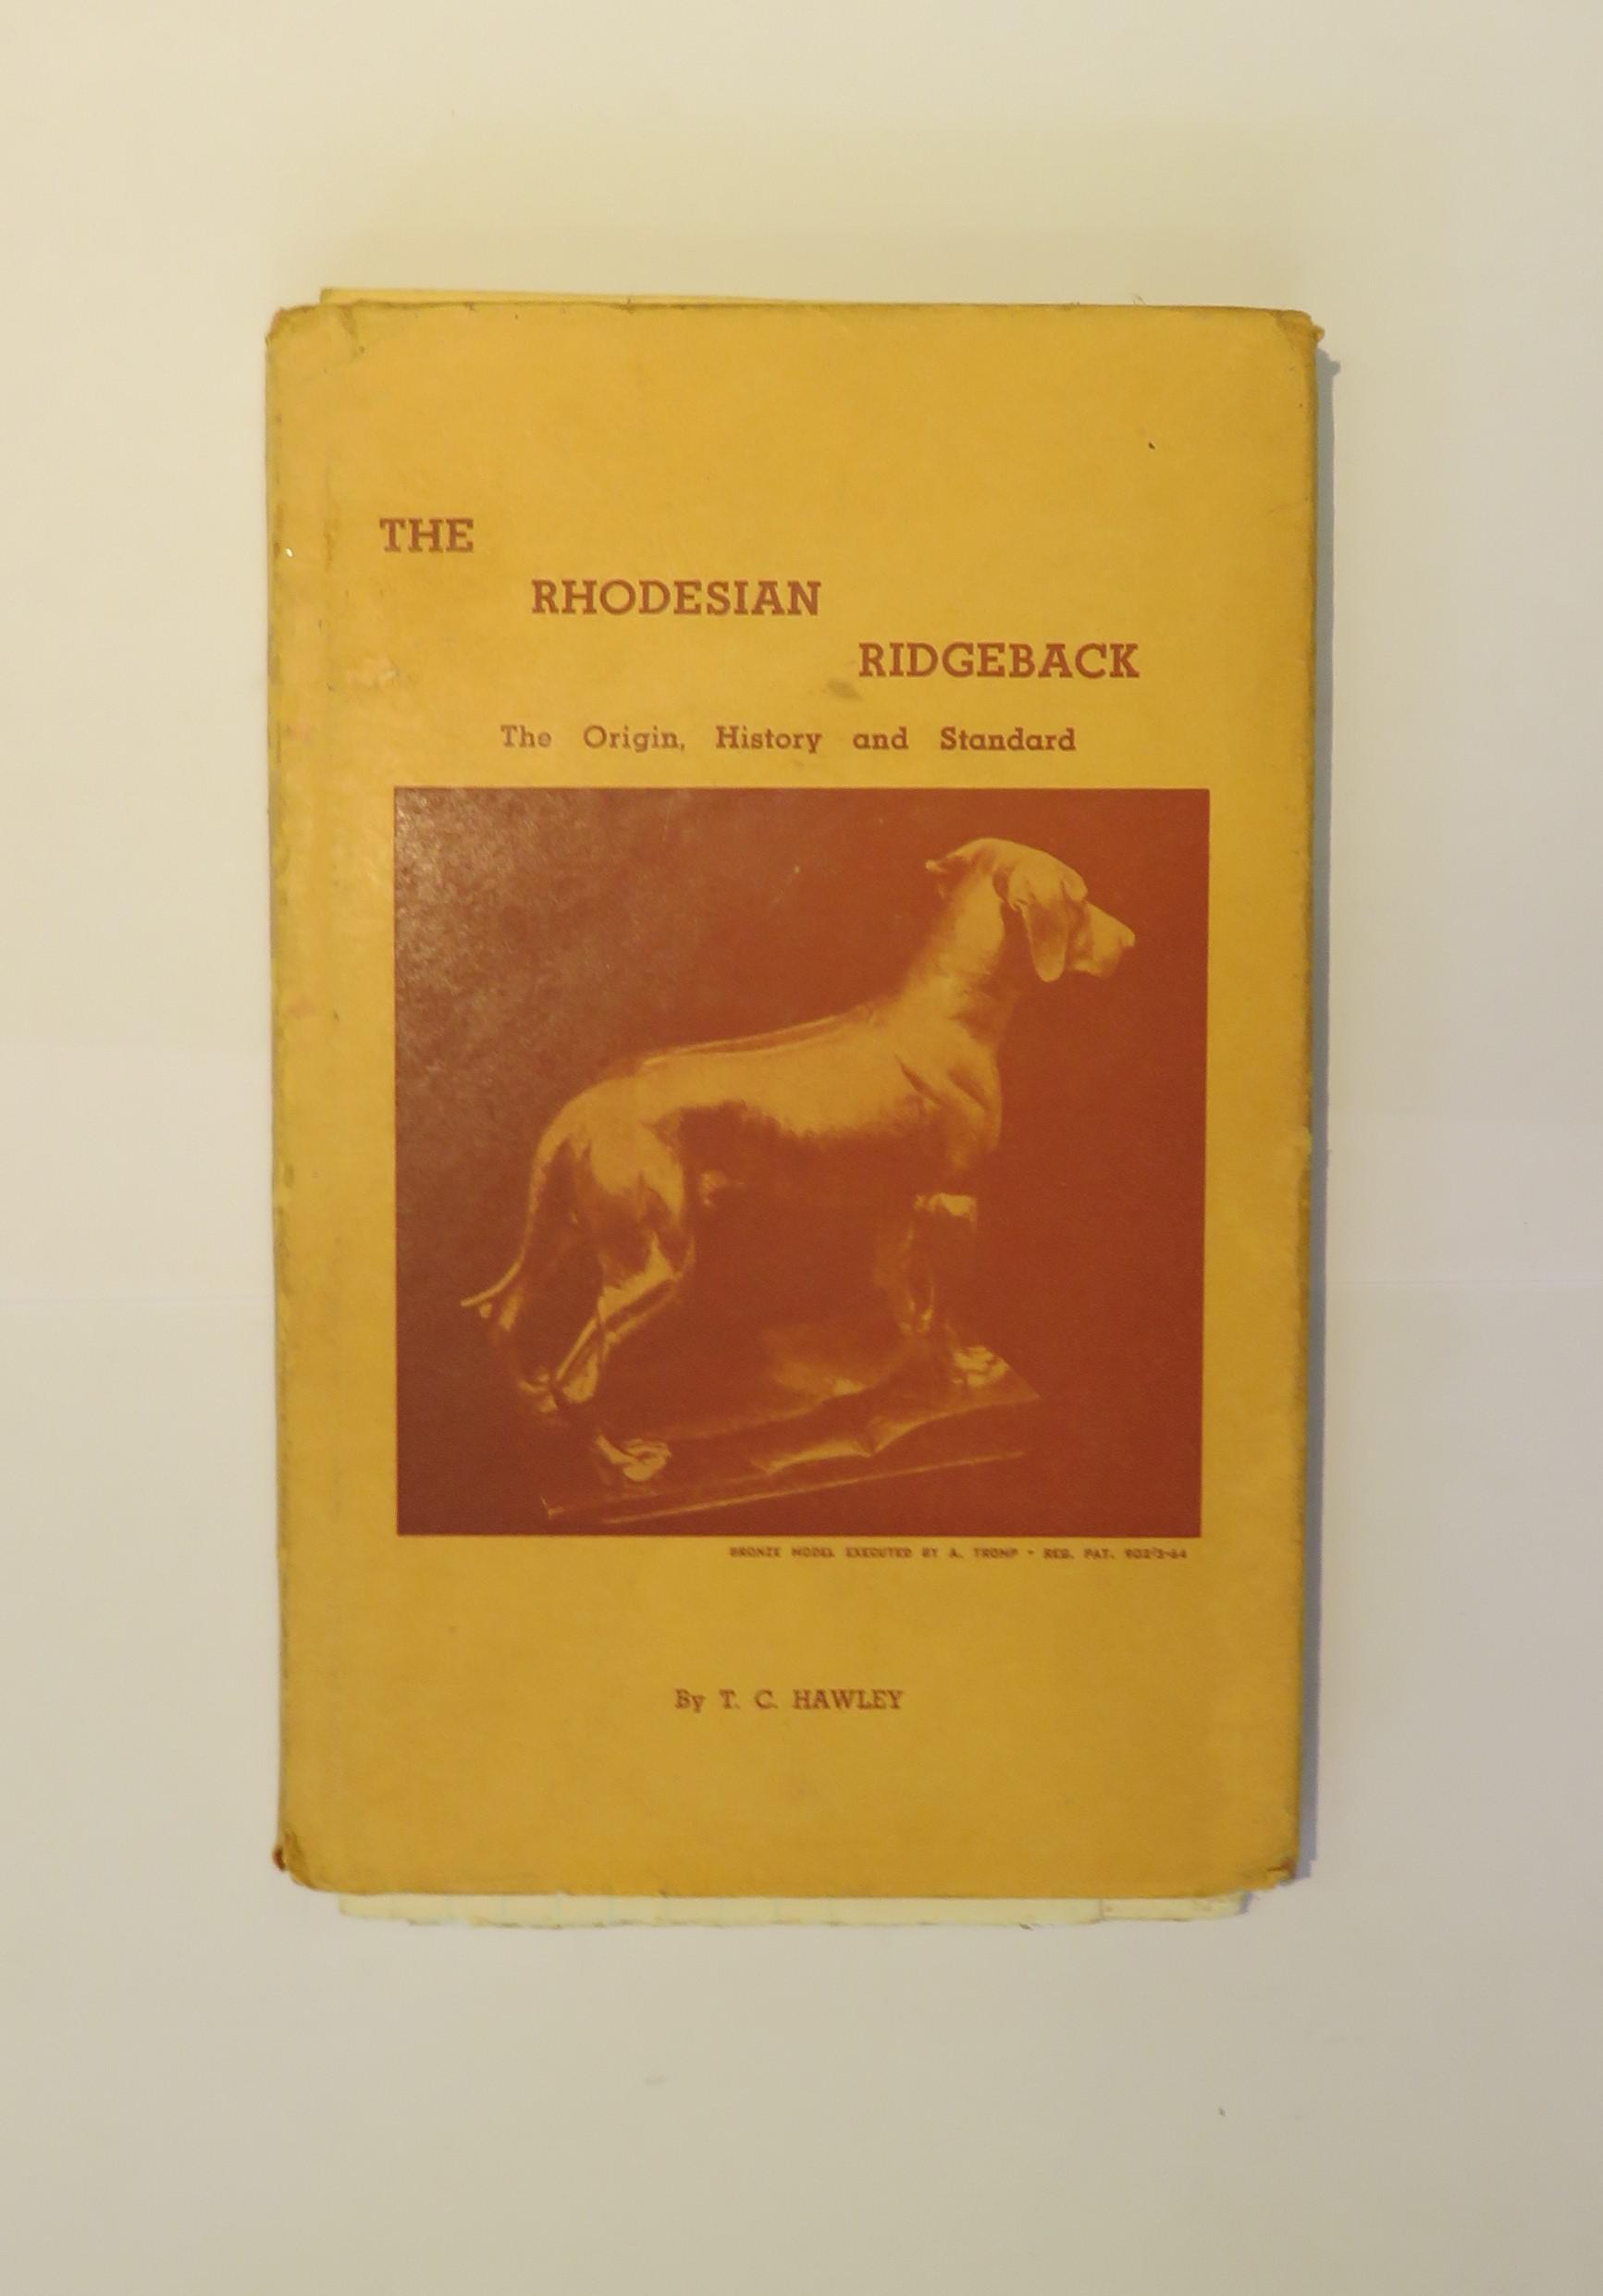 The Rhodesian Ridgeback